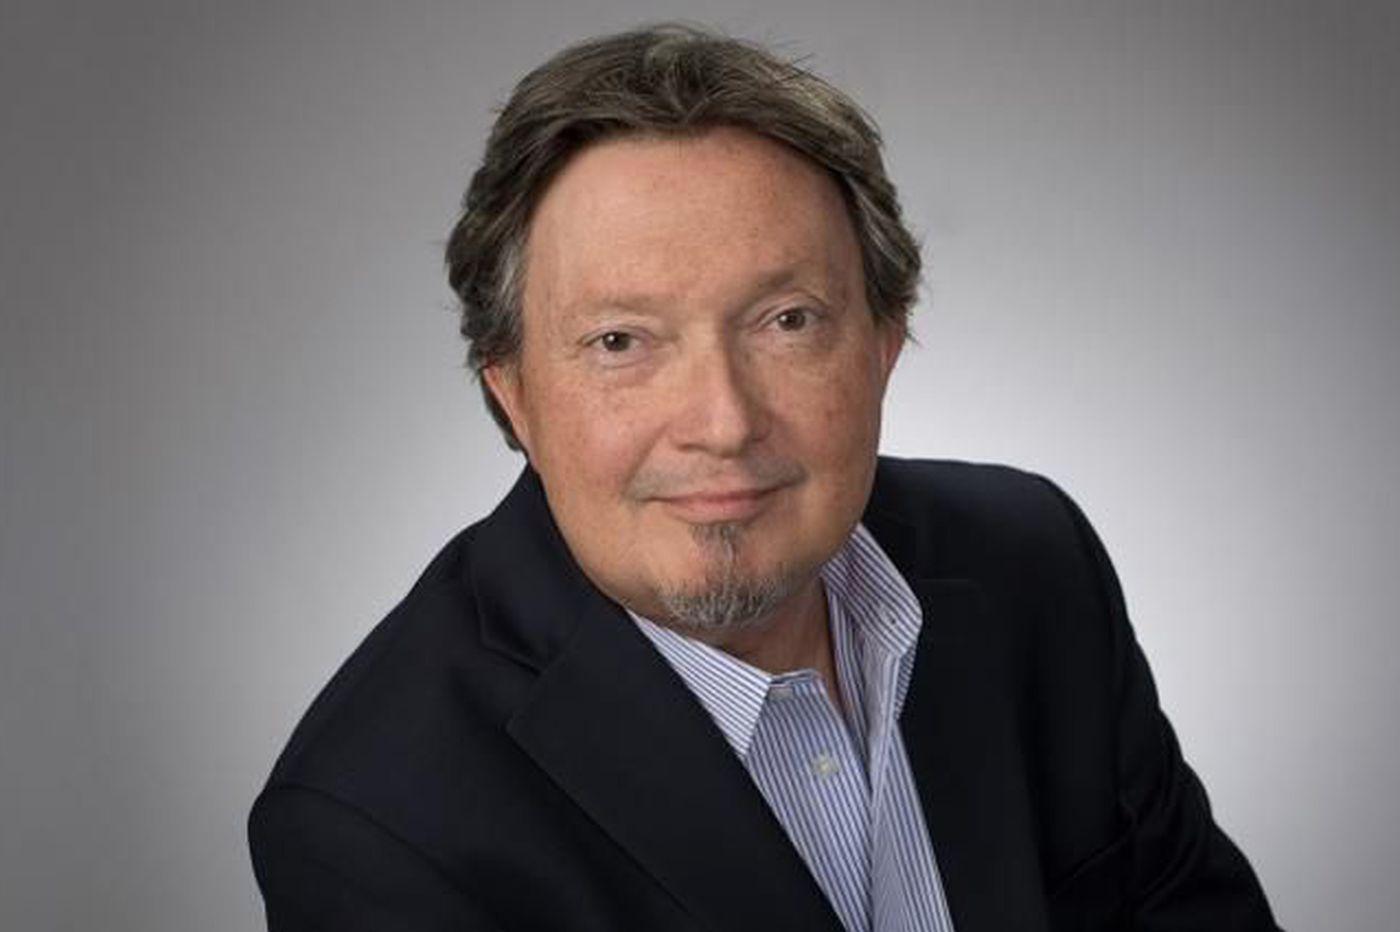 KYW Newsradio's Steve Nikazy gets ready to sign off